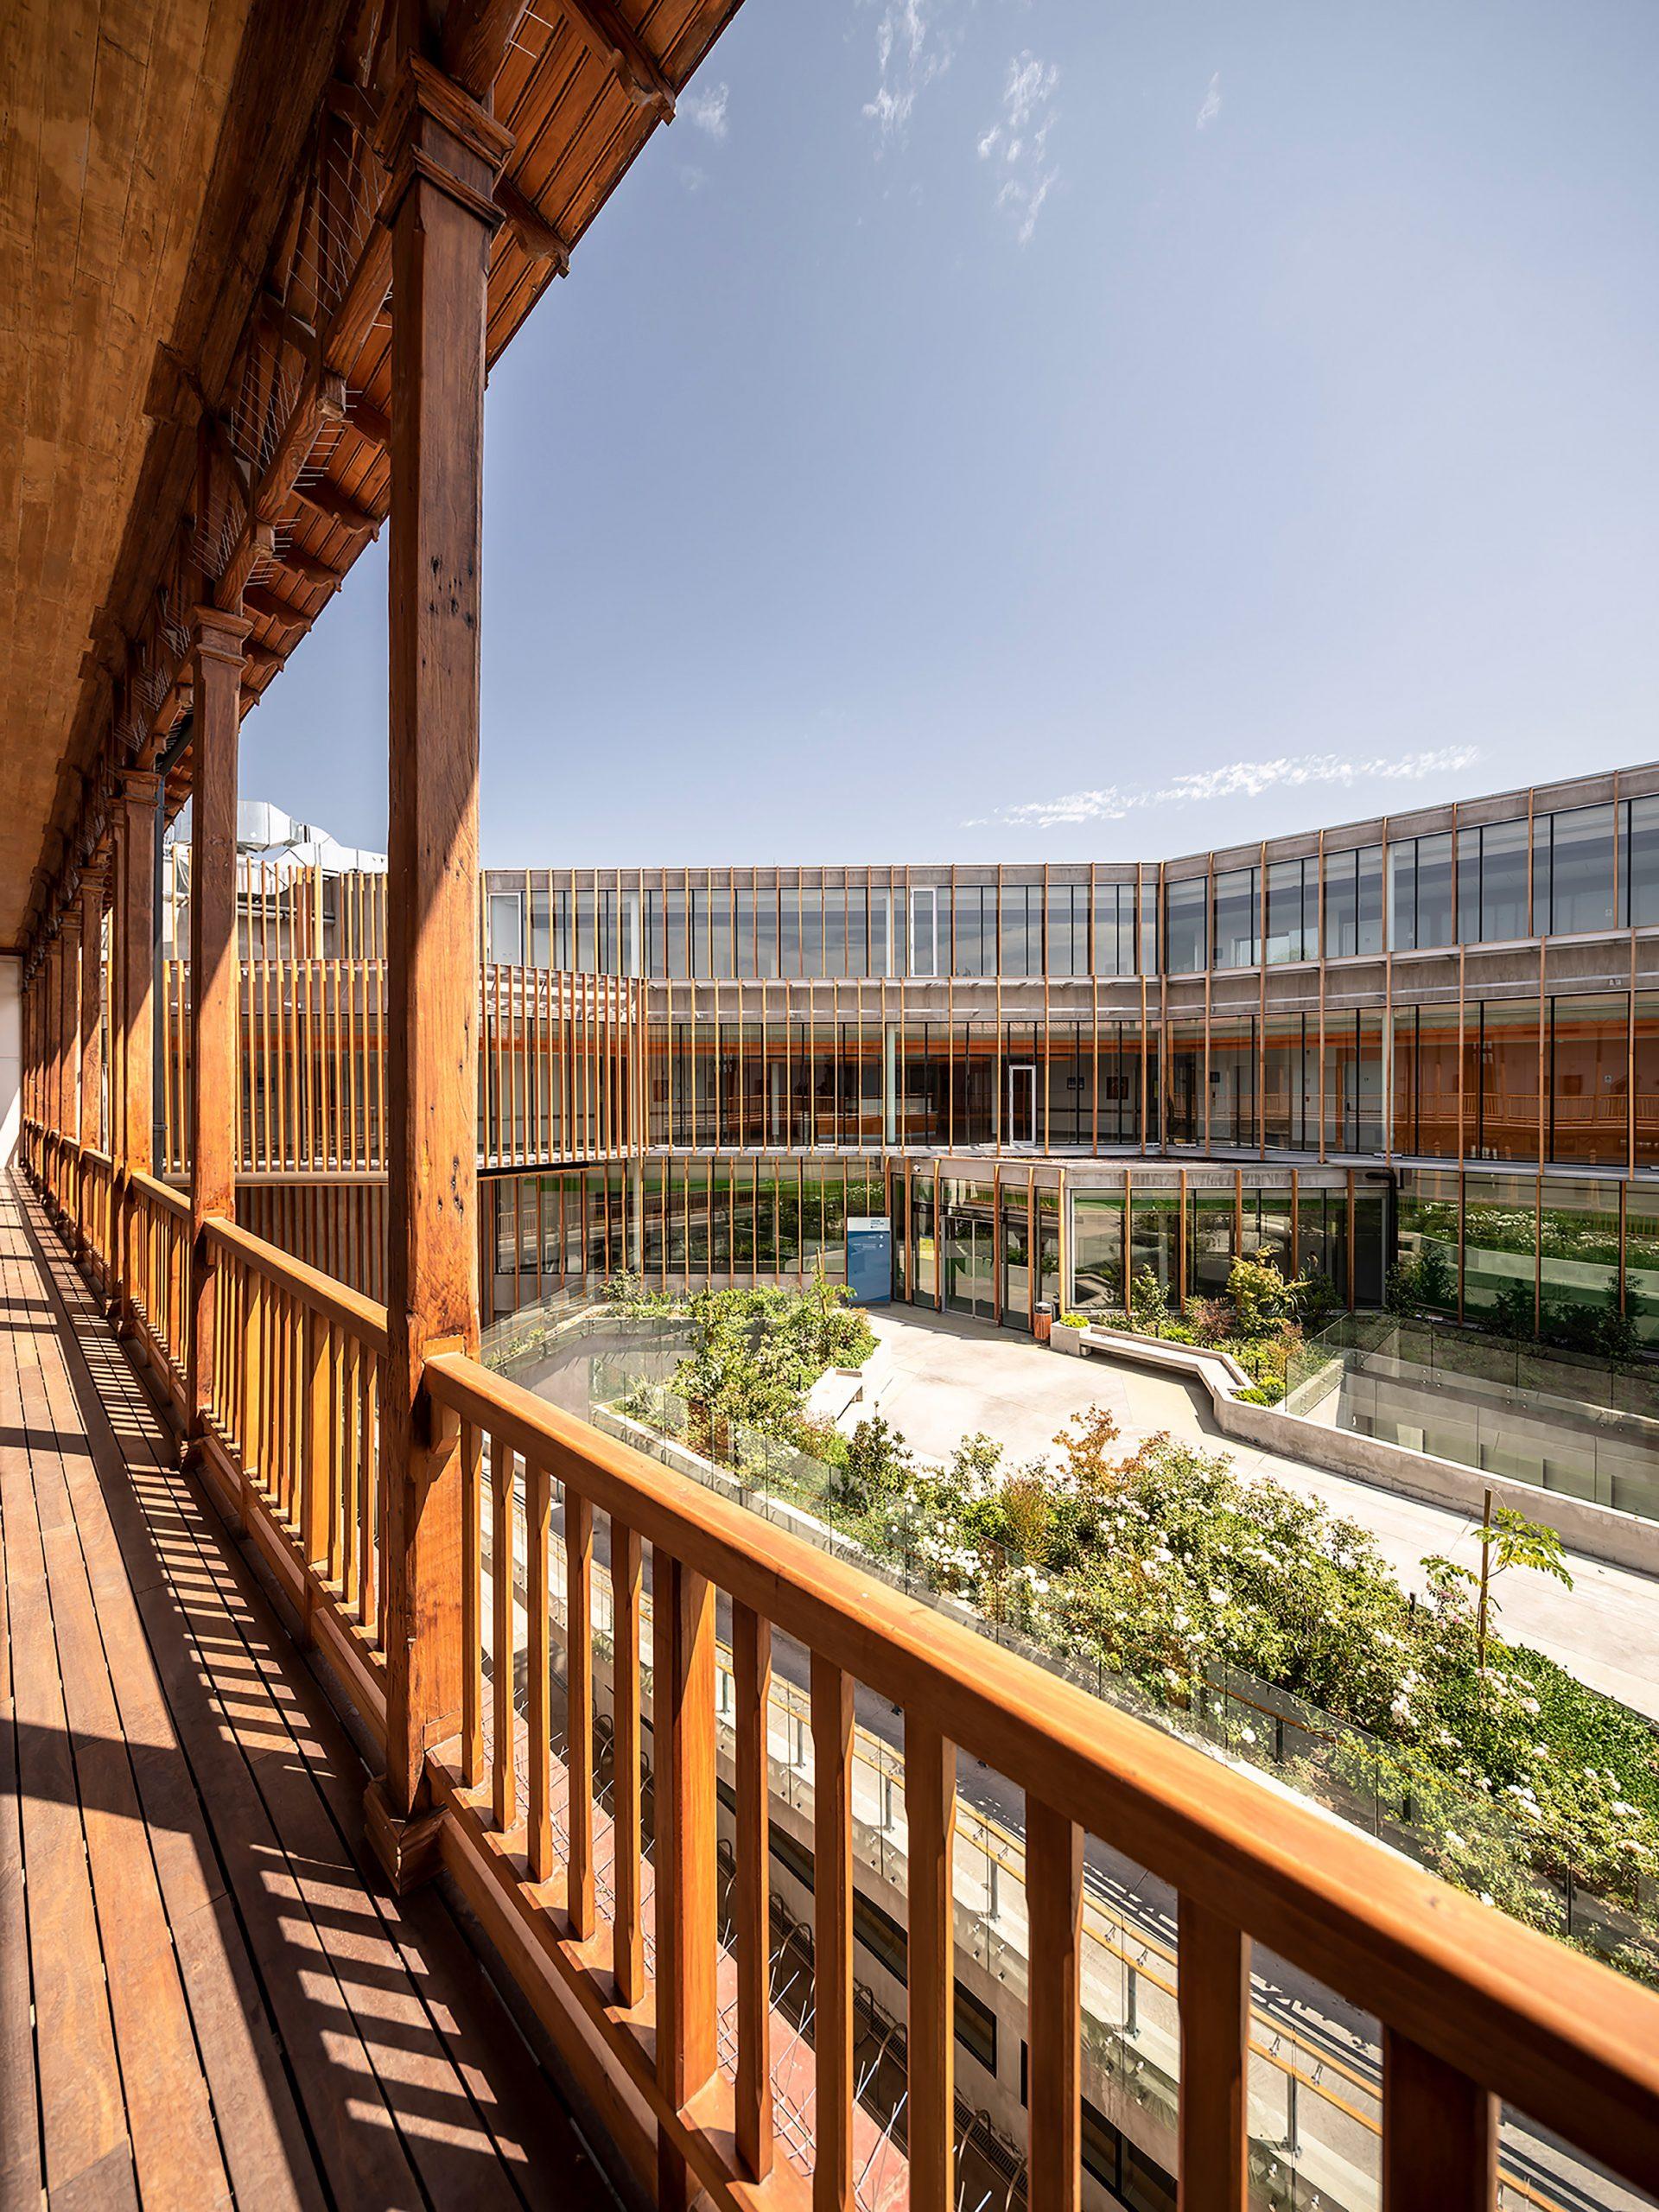 Luis Vidal + Architects designed the complex